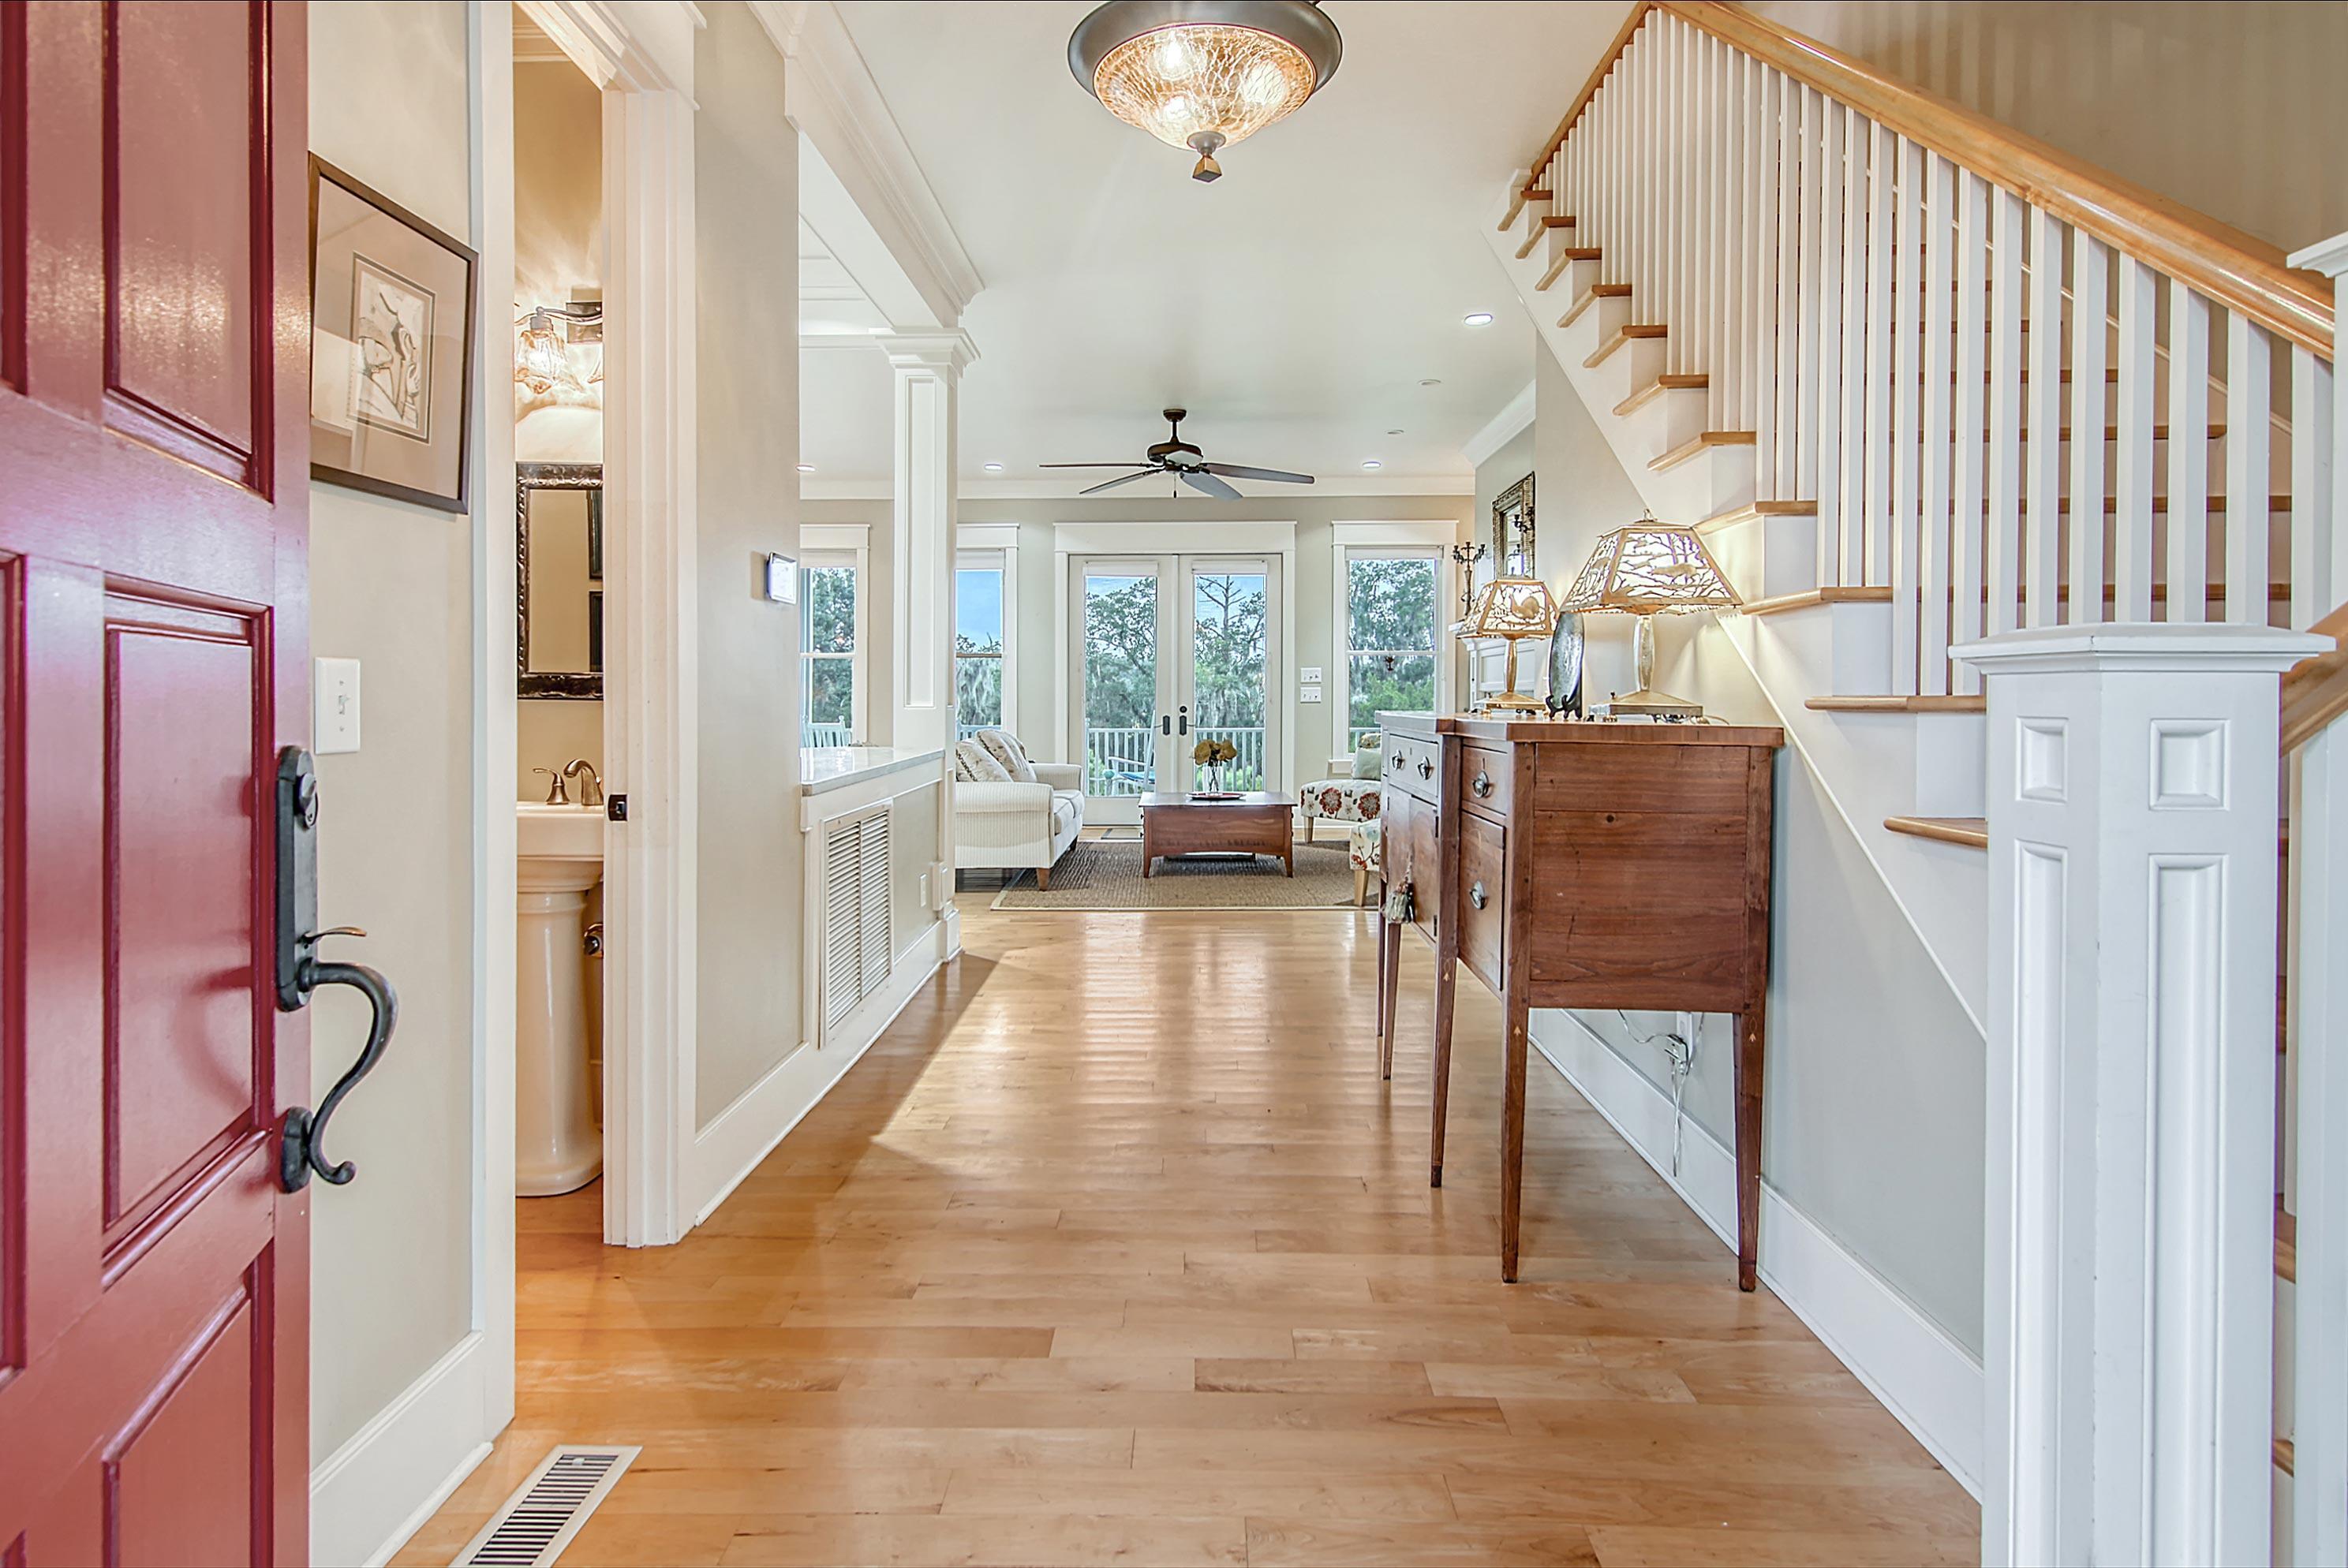 Scanlonville Homes For Sale - 152 6th, Mount Pleasant, SC - 15